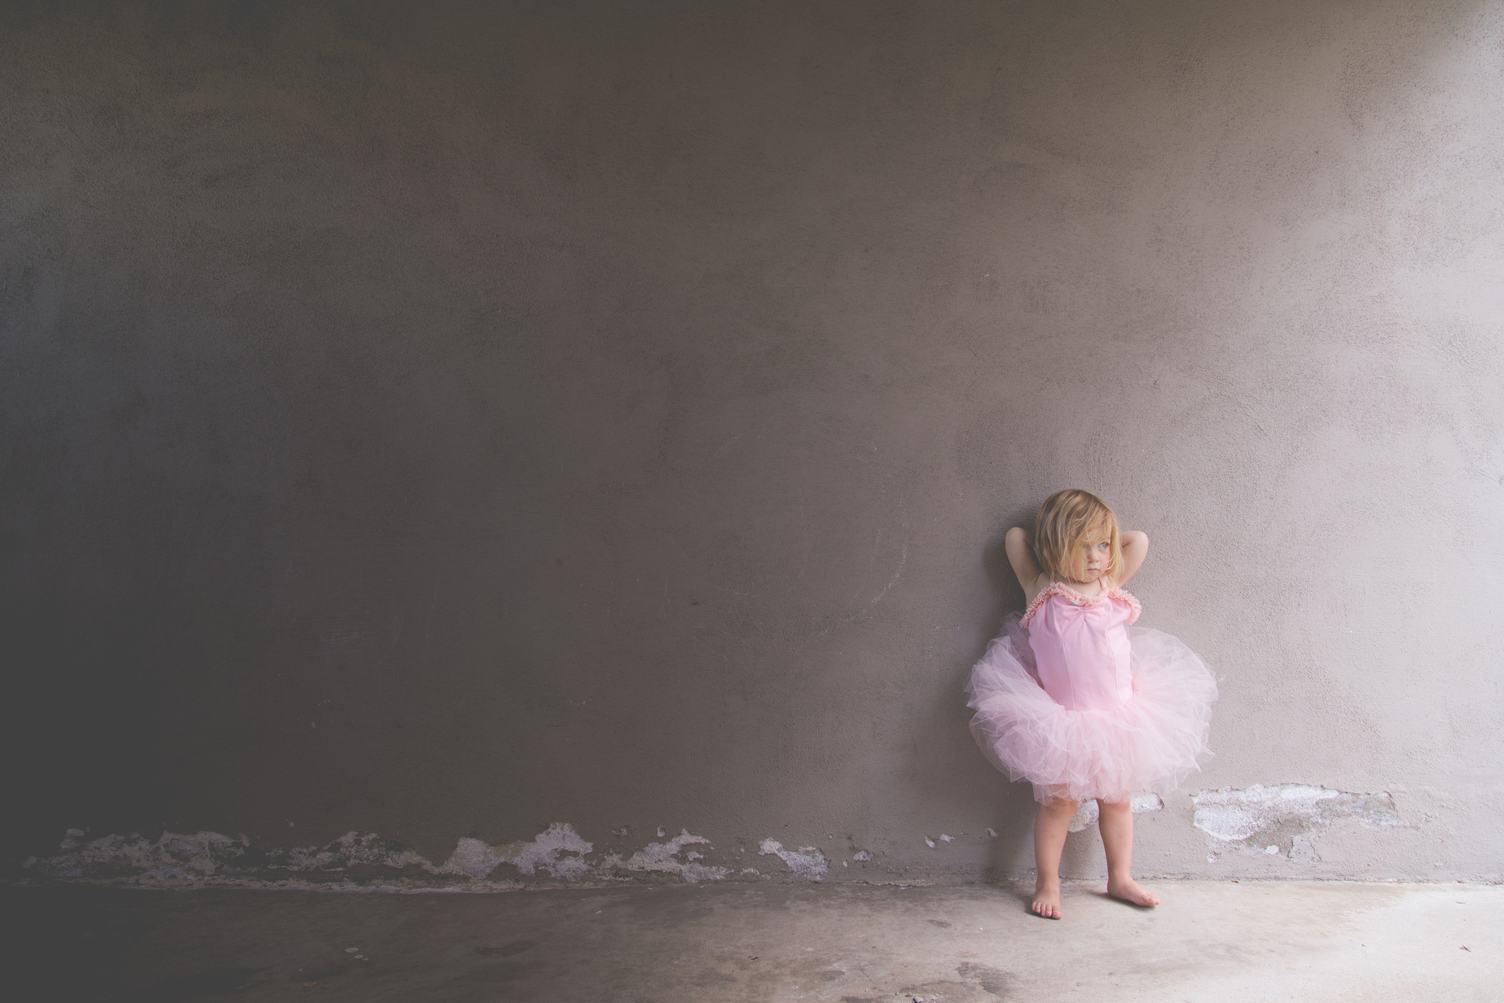 Little Girl in a Pink Ballerina Costume